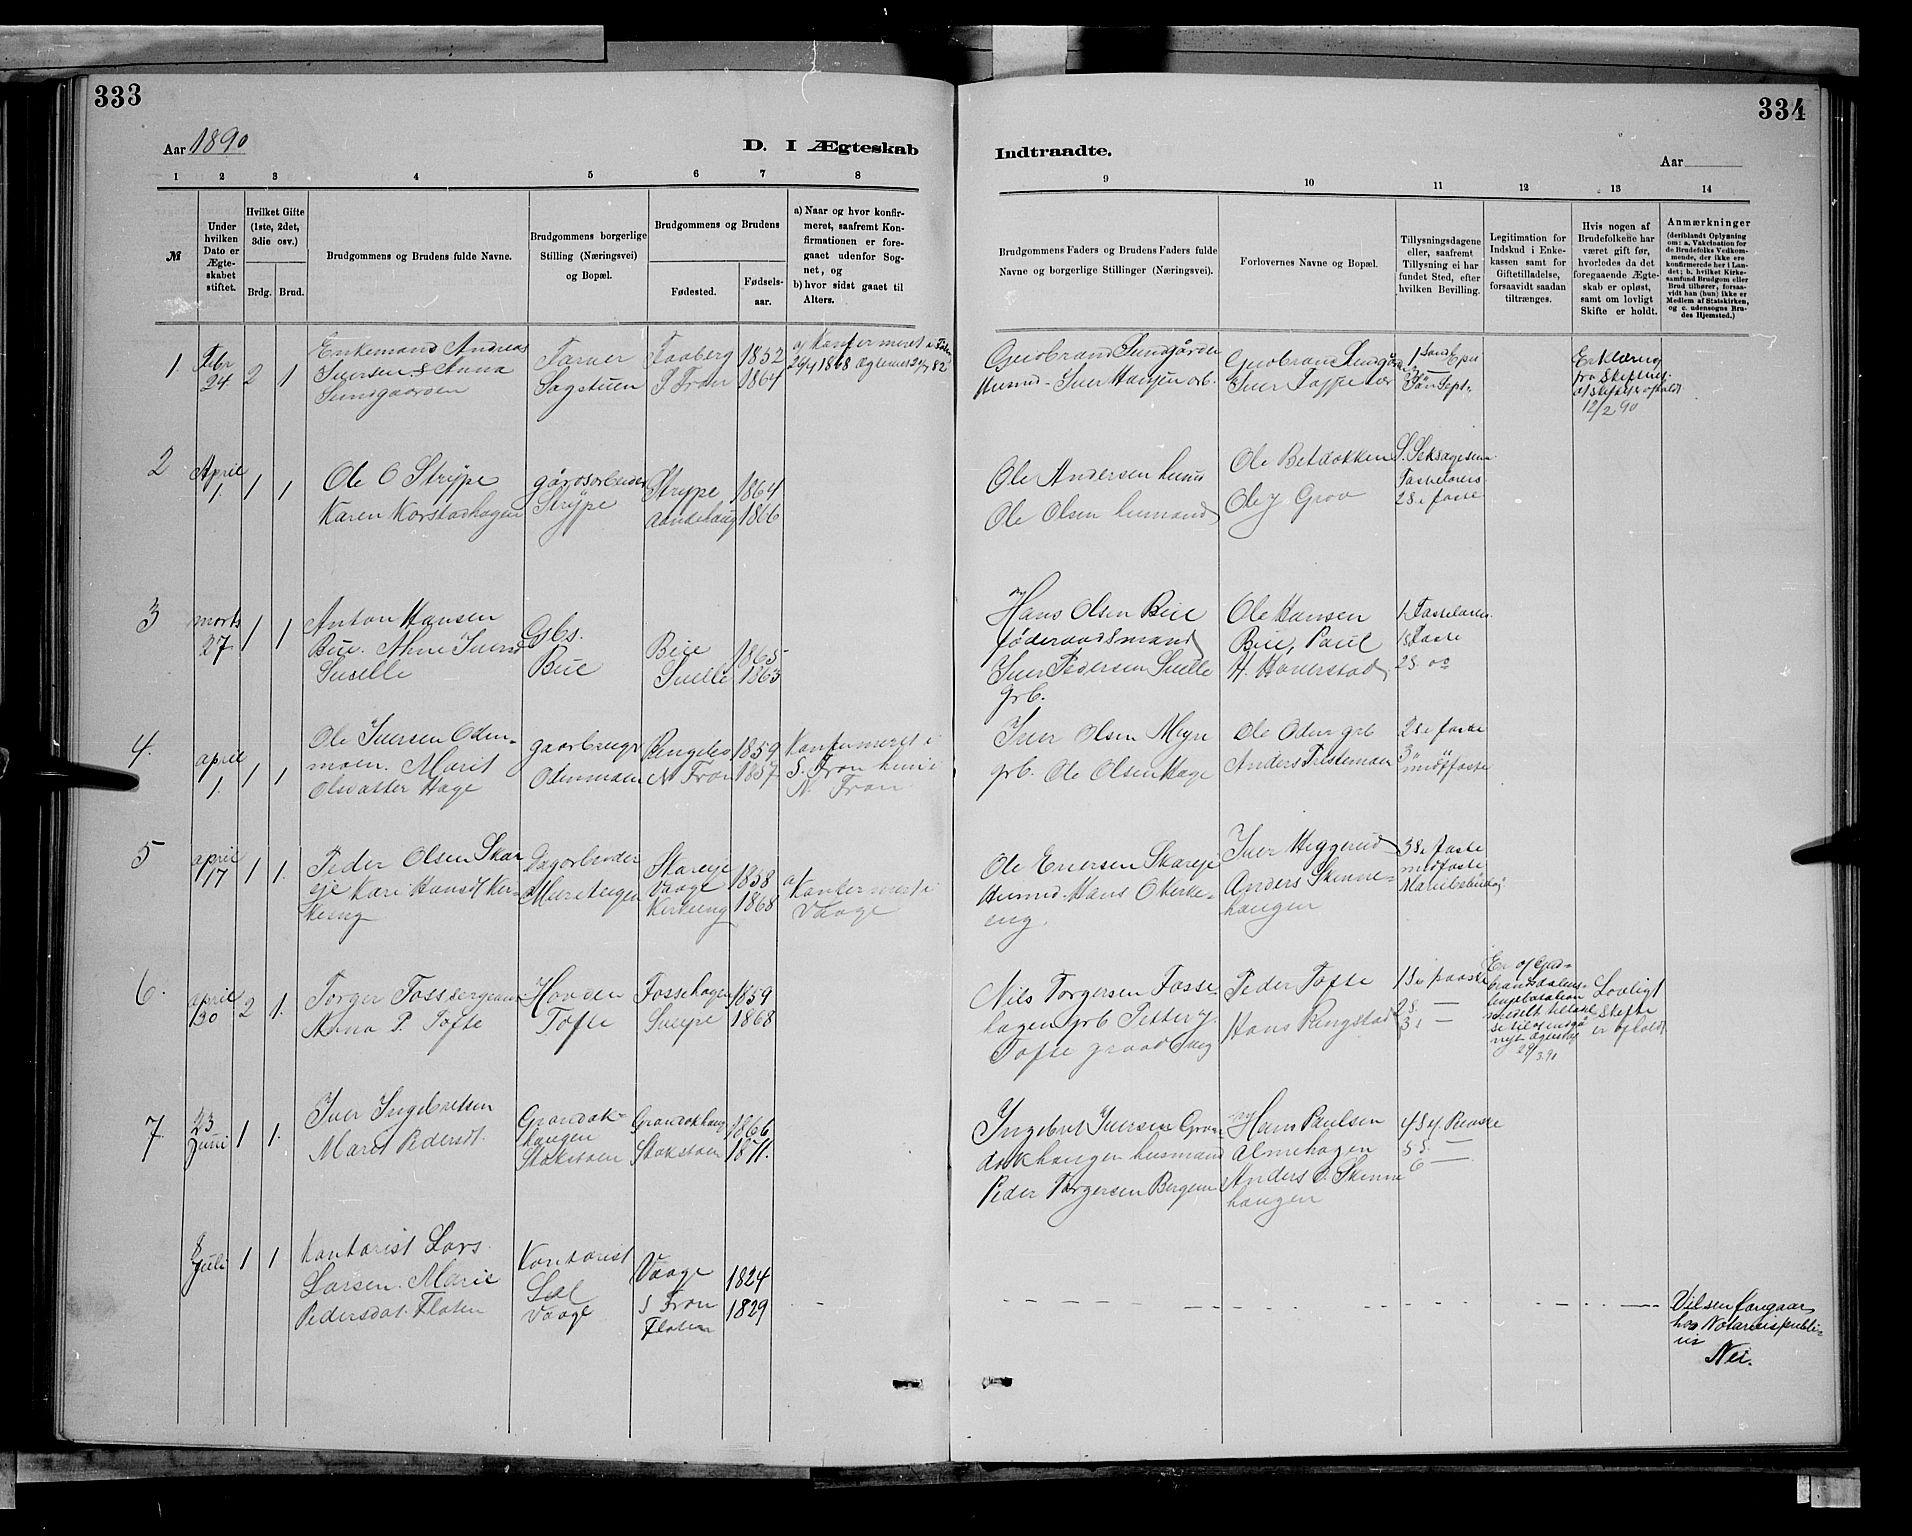 SAH, Sør-Fron prestekontor, H/Ha/Hab/L0003: Klokkerbok nr. 3, 1884-1896, s. 333-334